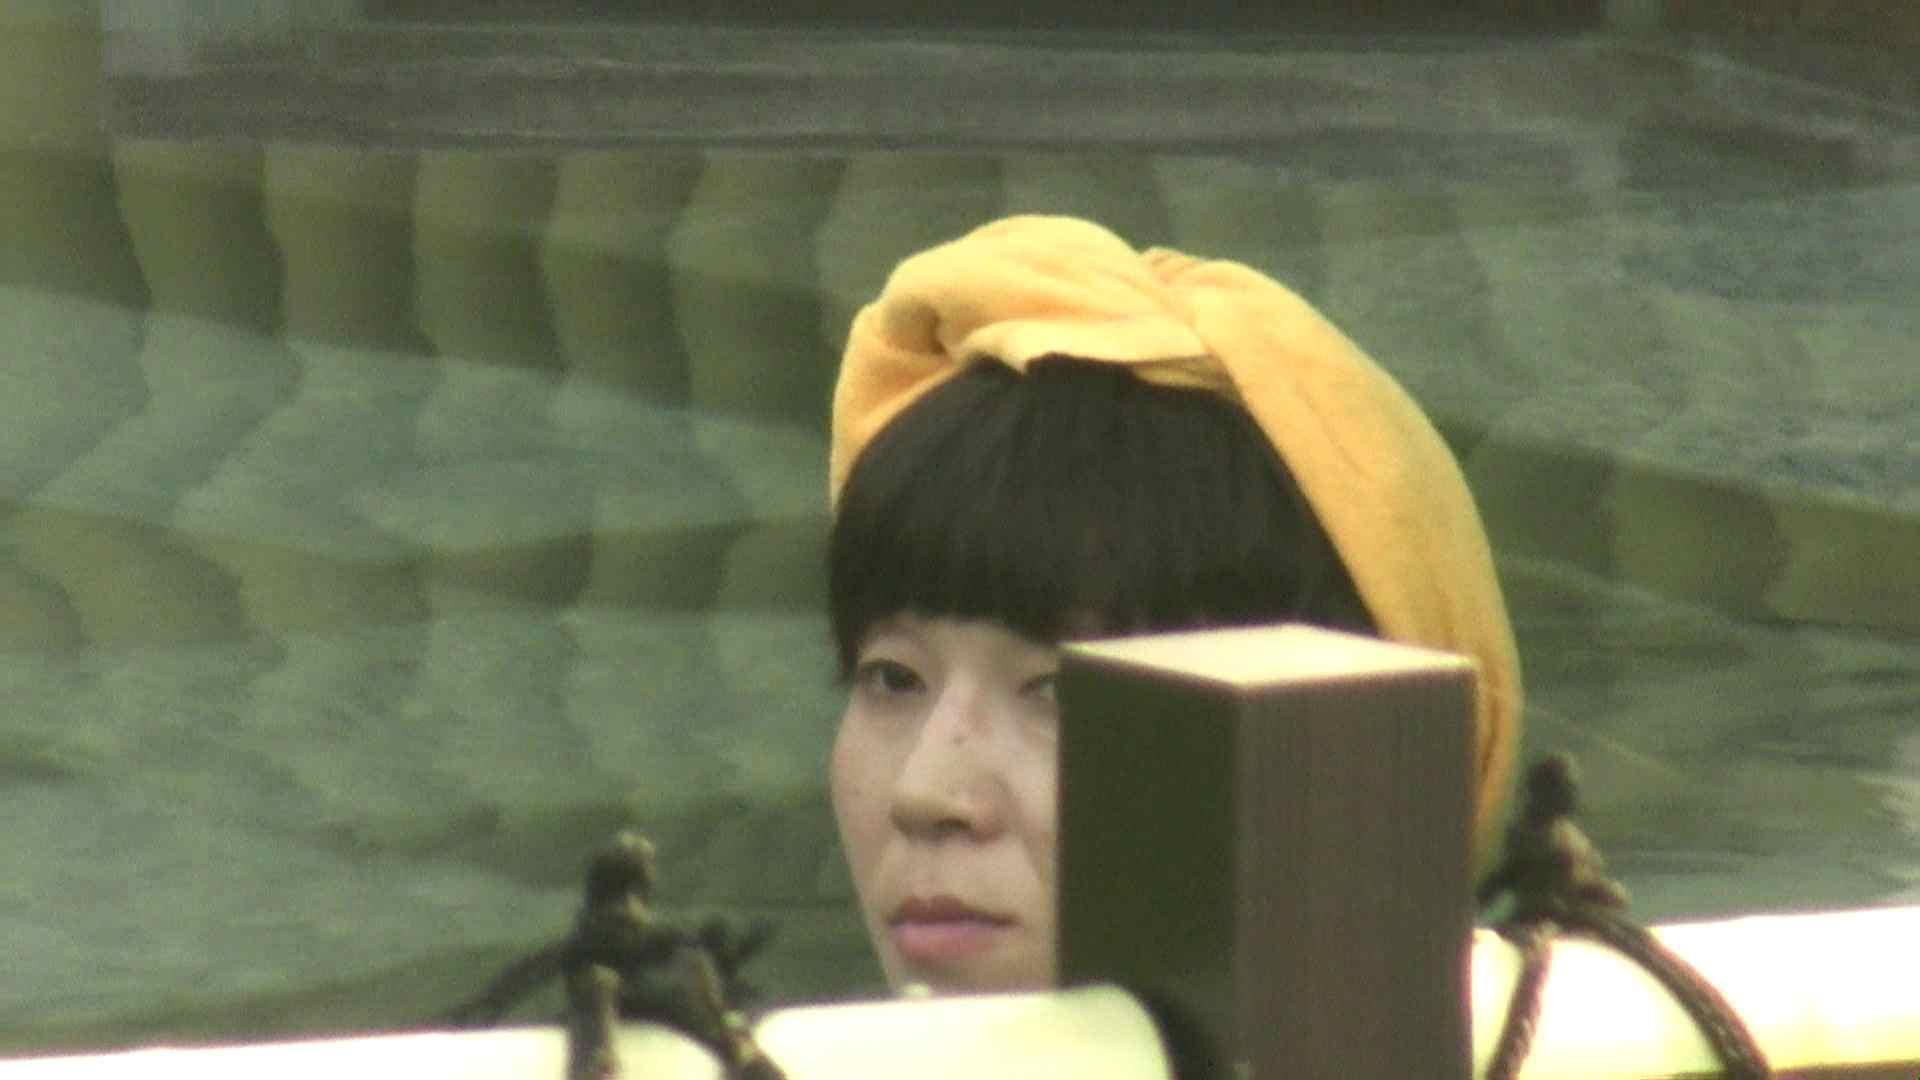 Aquaな露天風呂Vol.633 盗撮特撮 のぞき動画画像 10pic 5